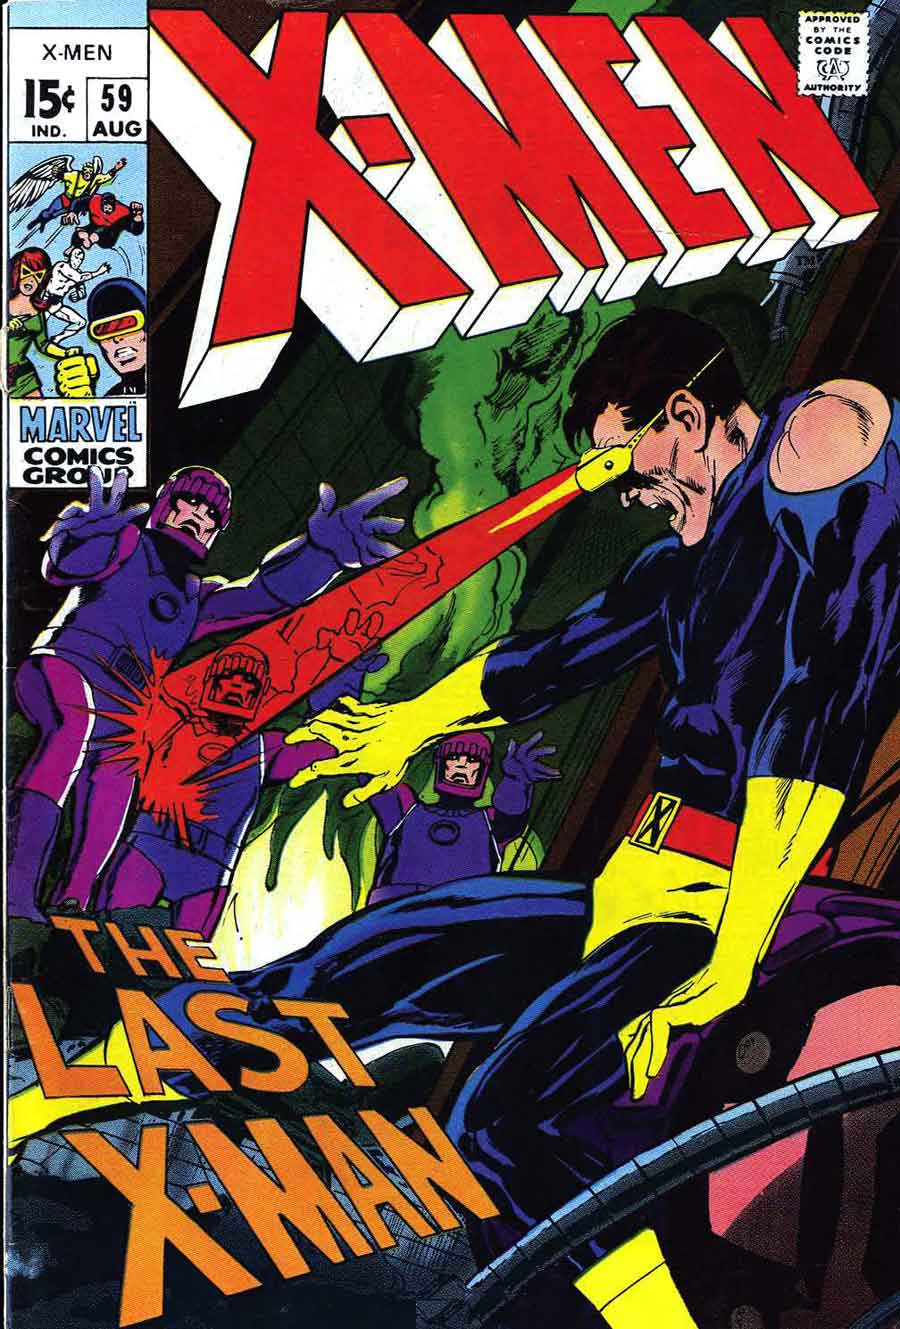 Marvel Comic Book Cover Art : X men neal adams art cover top pencil ink